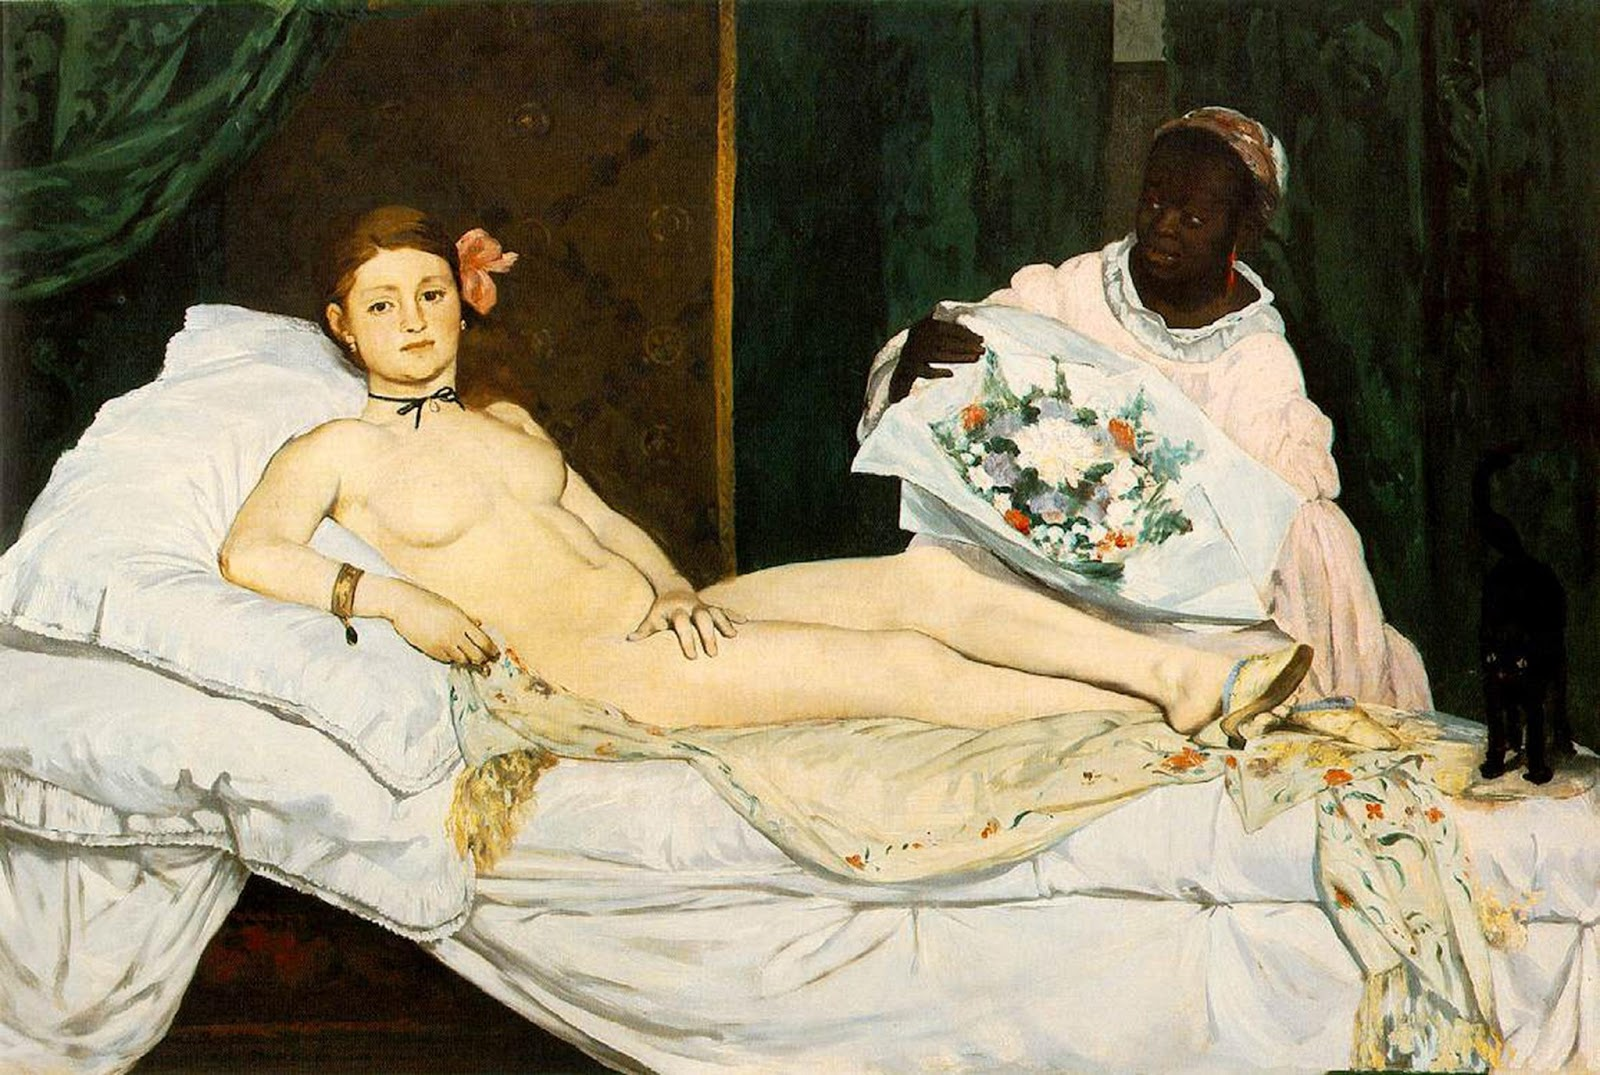 [Jeu] Association d'images - Page 4 1863+Edouard+Manet,+Olympia